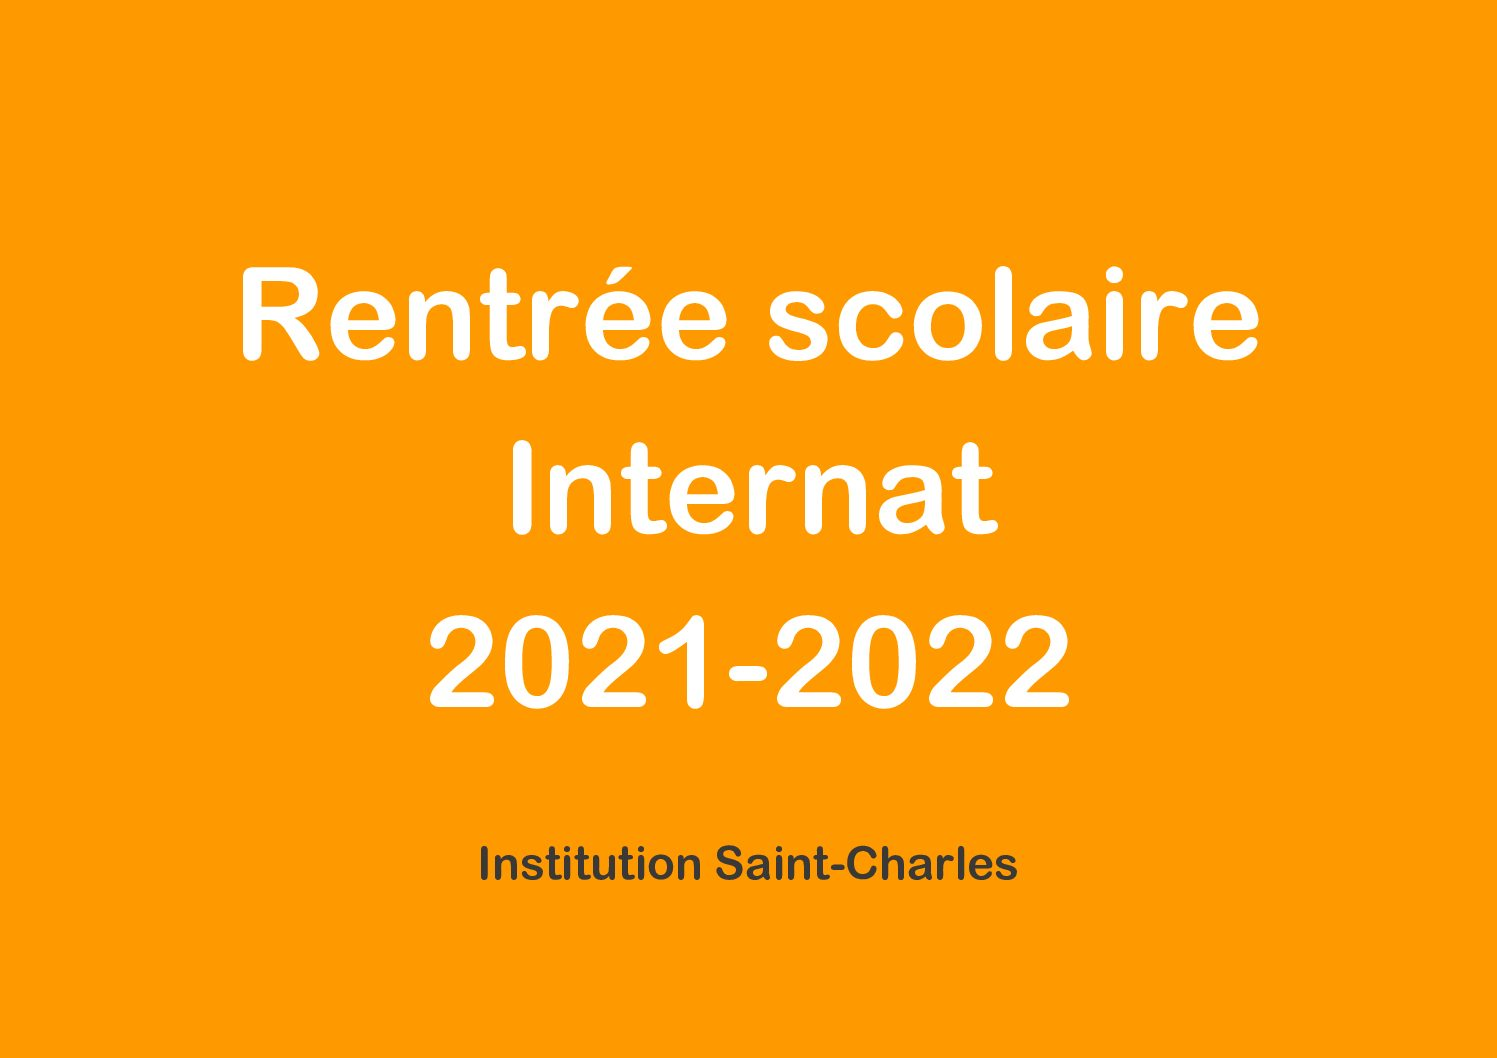 Rentrée 2021-2022 : Internat